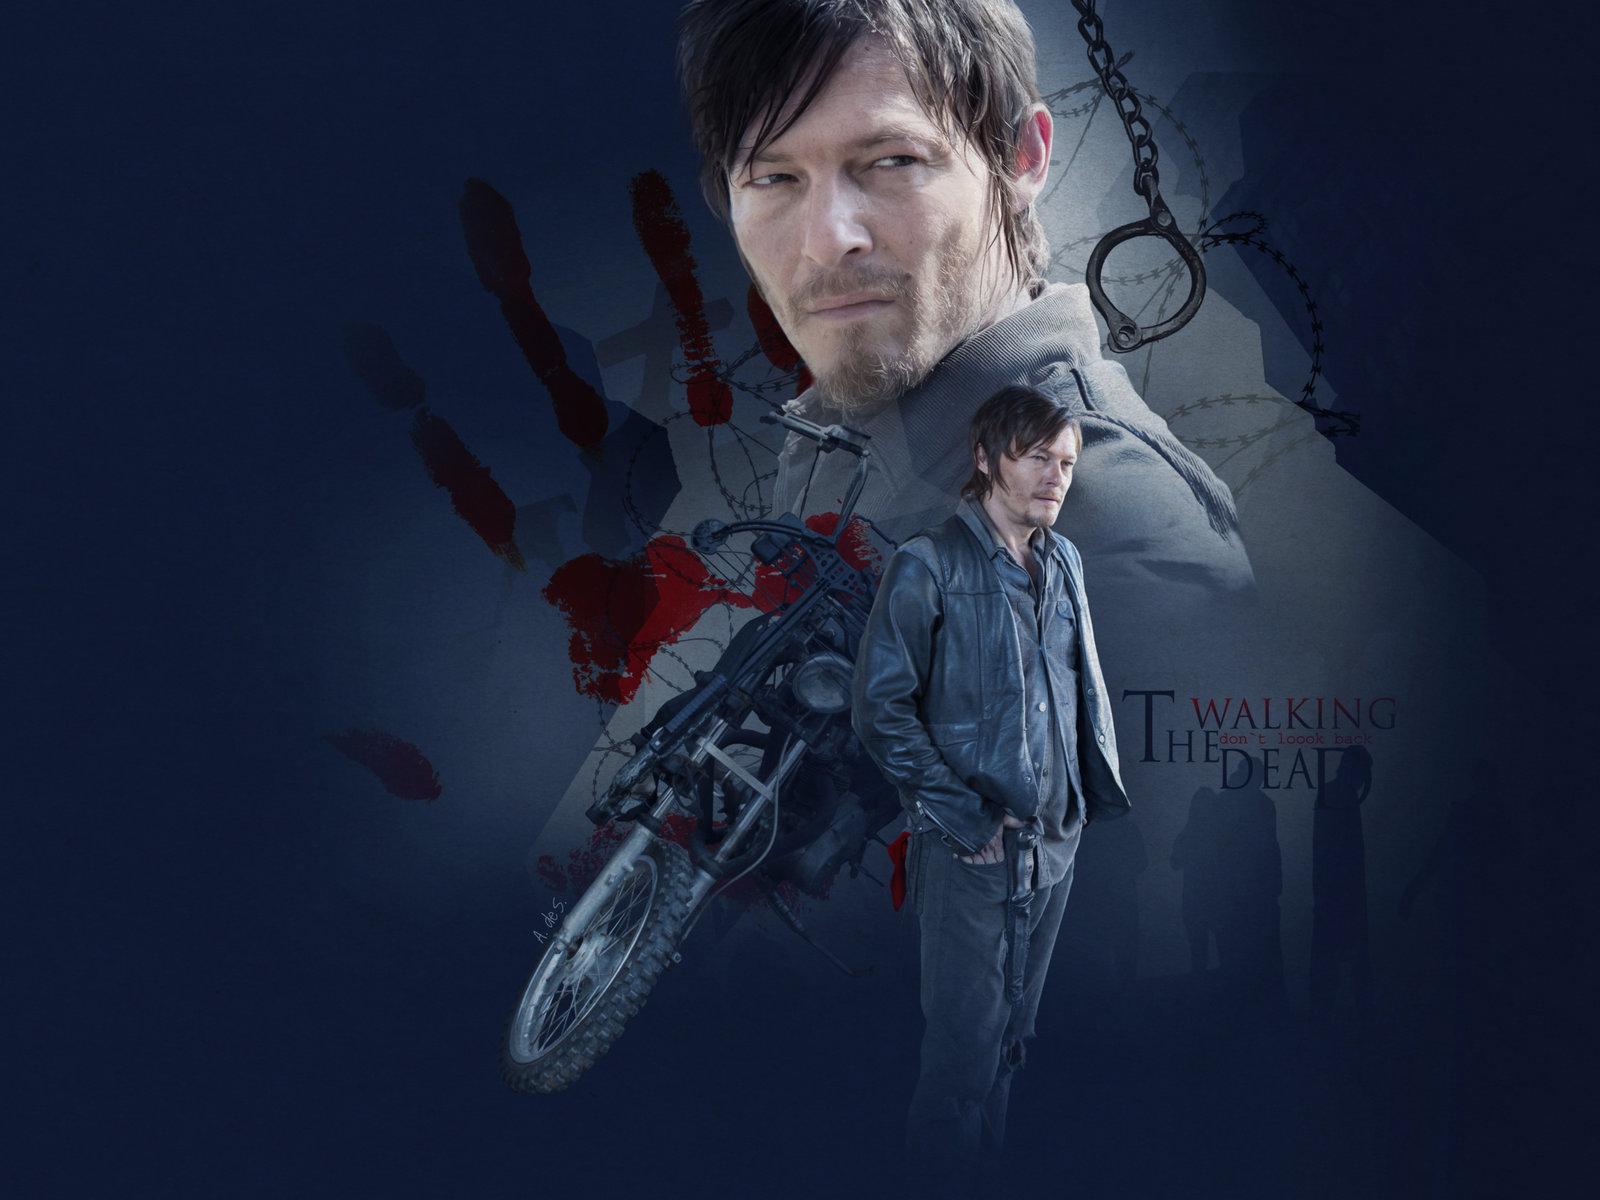 Walking Dead Daryl Dixon Wallpaper